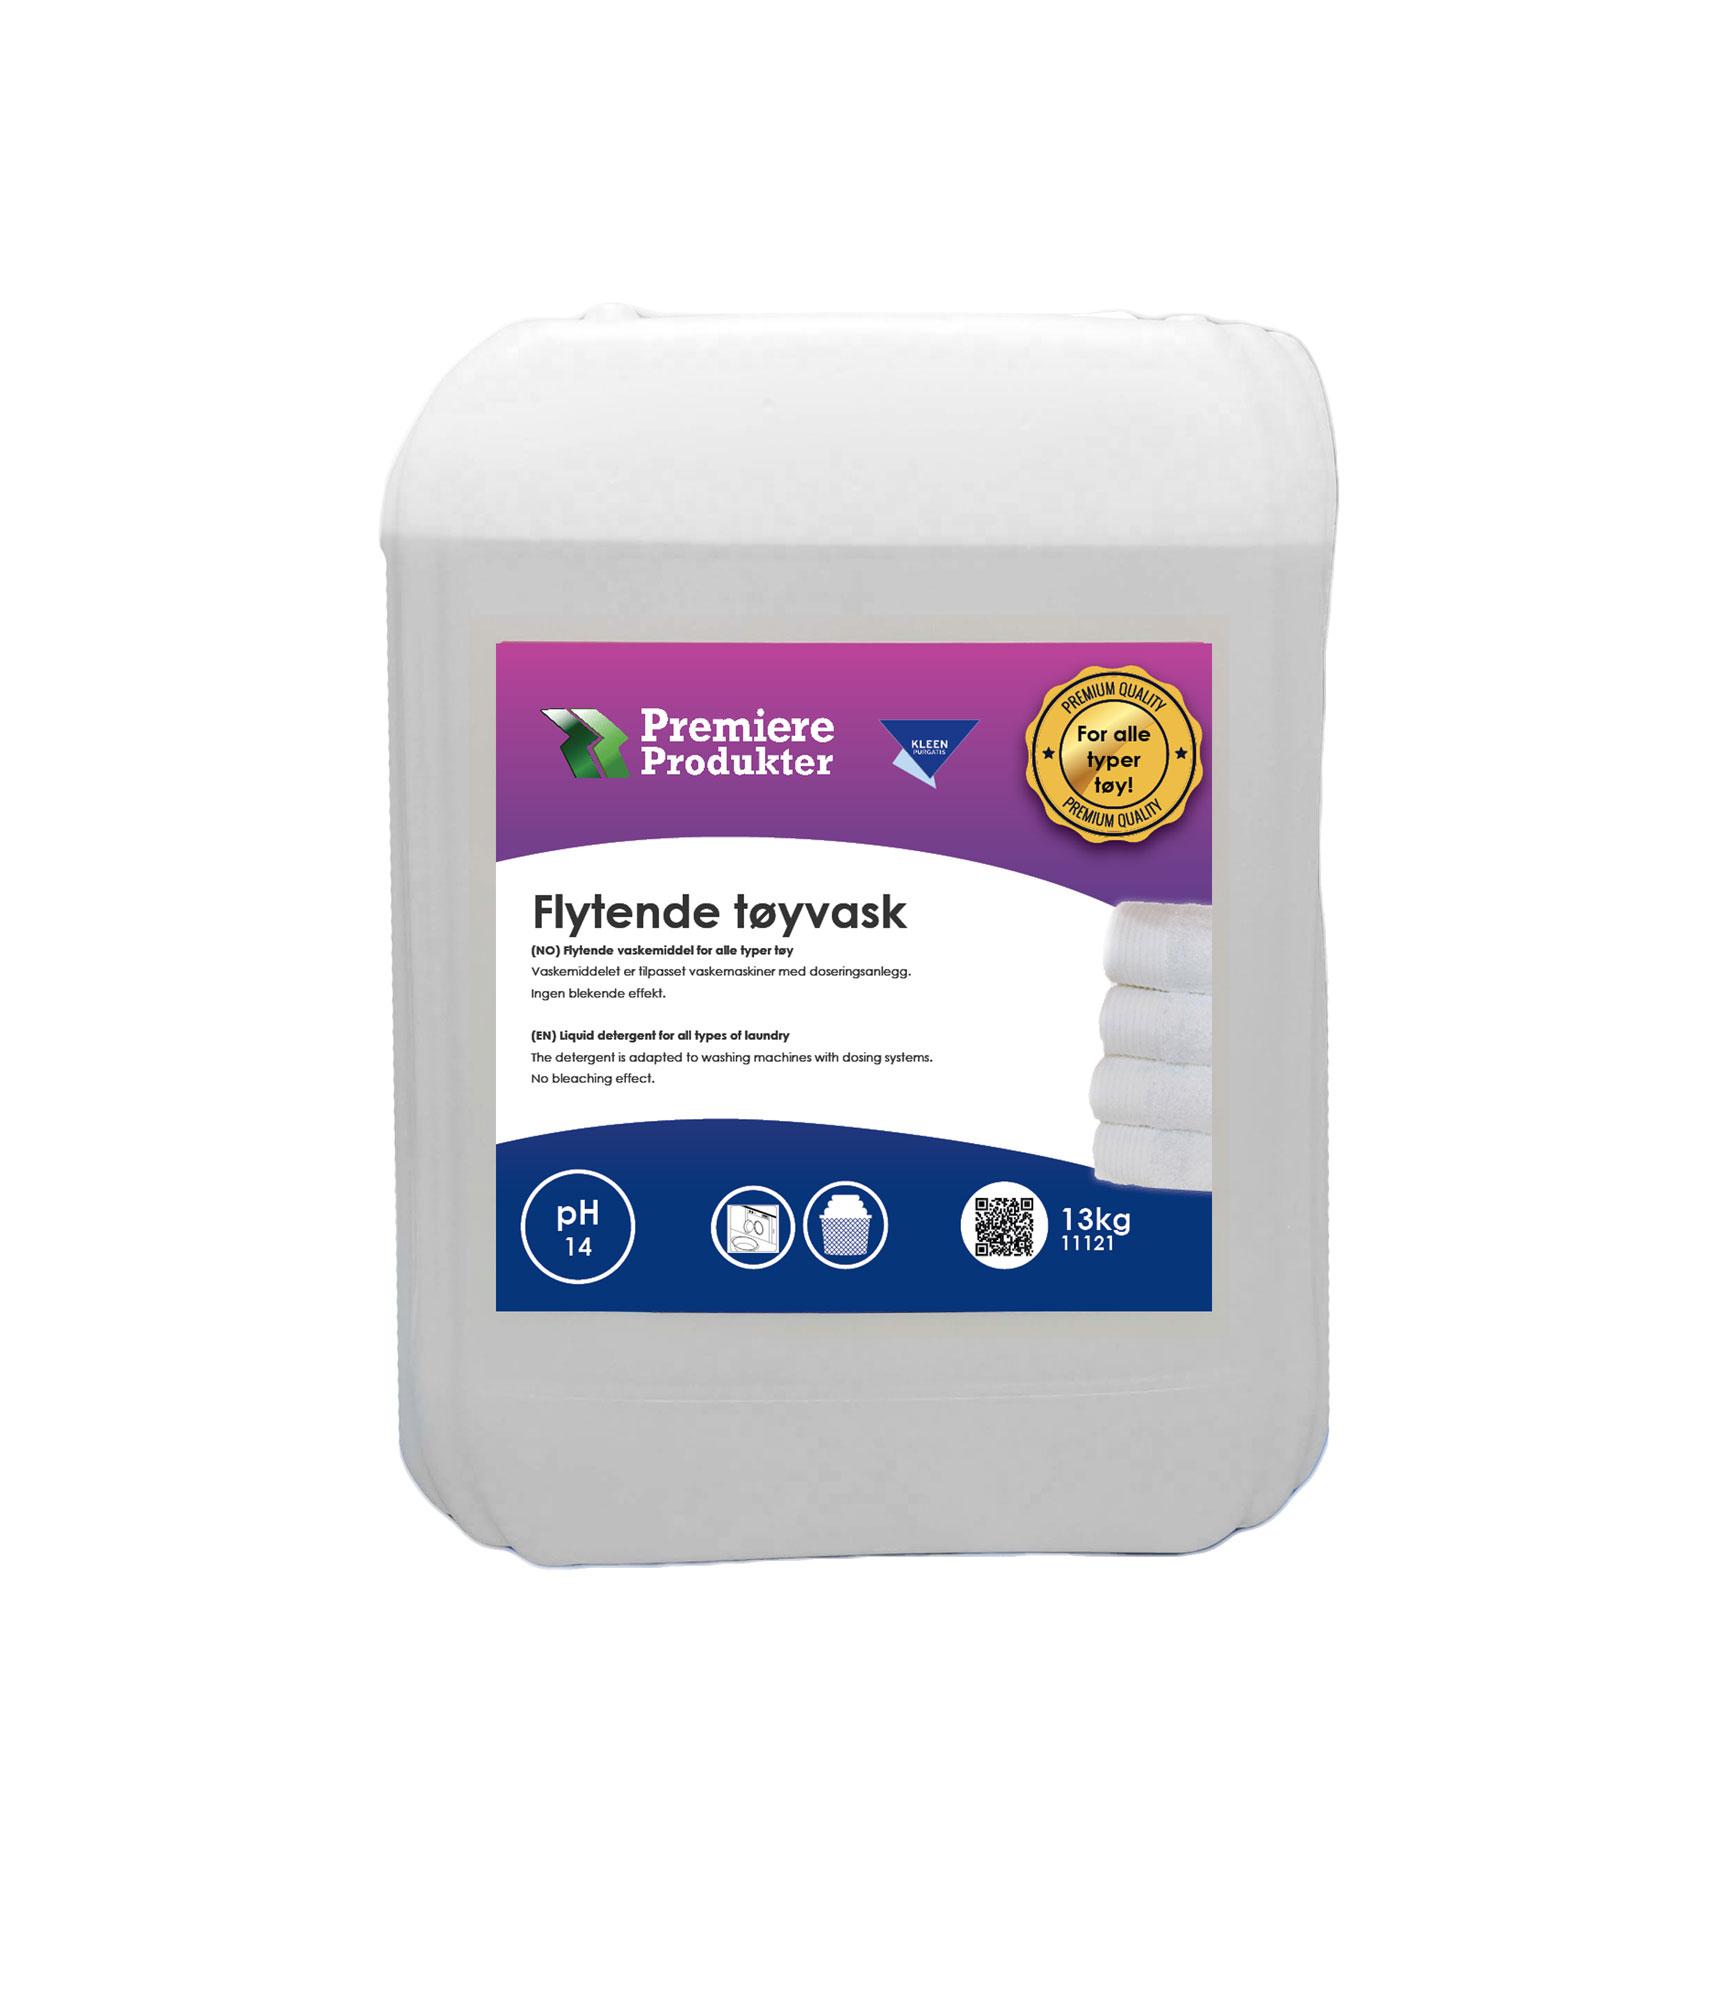 Laundry detergent - Industrial